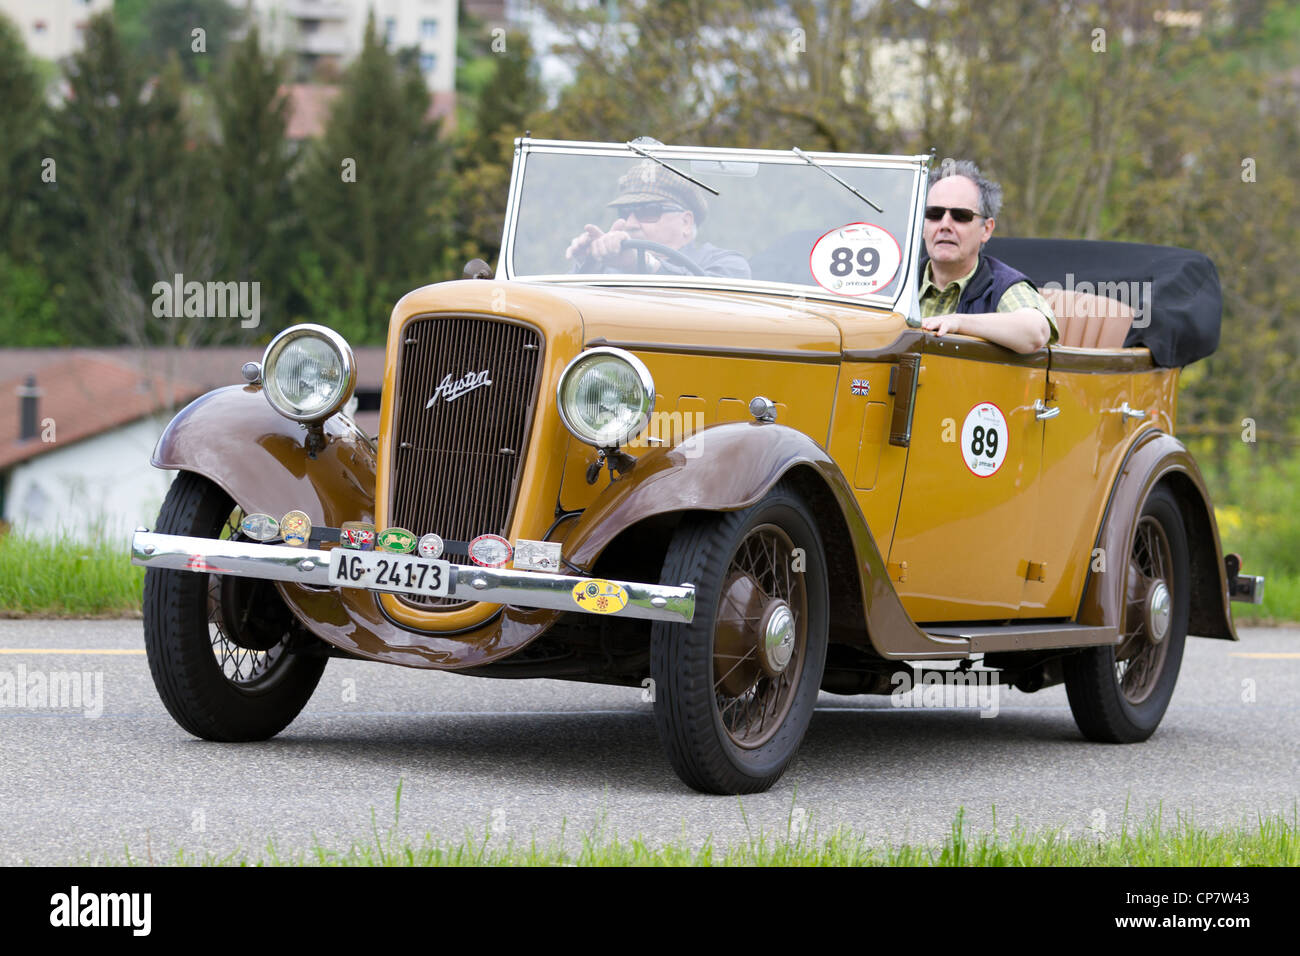 Vintage pre war race car Austin Tourer from 1936 at Grand Prix in Mutschellen, SUI on April 29, 2012. - Stock Image